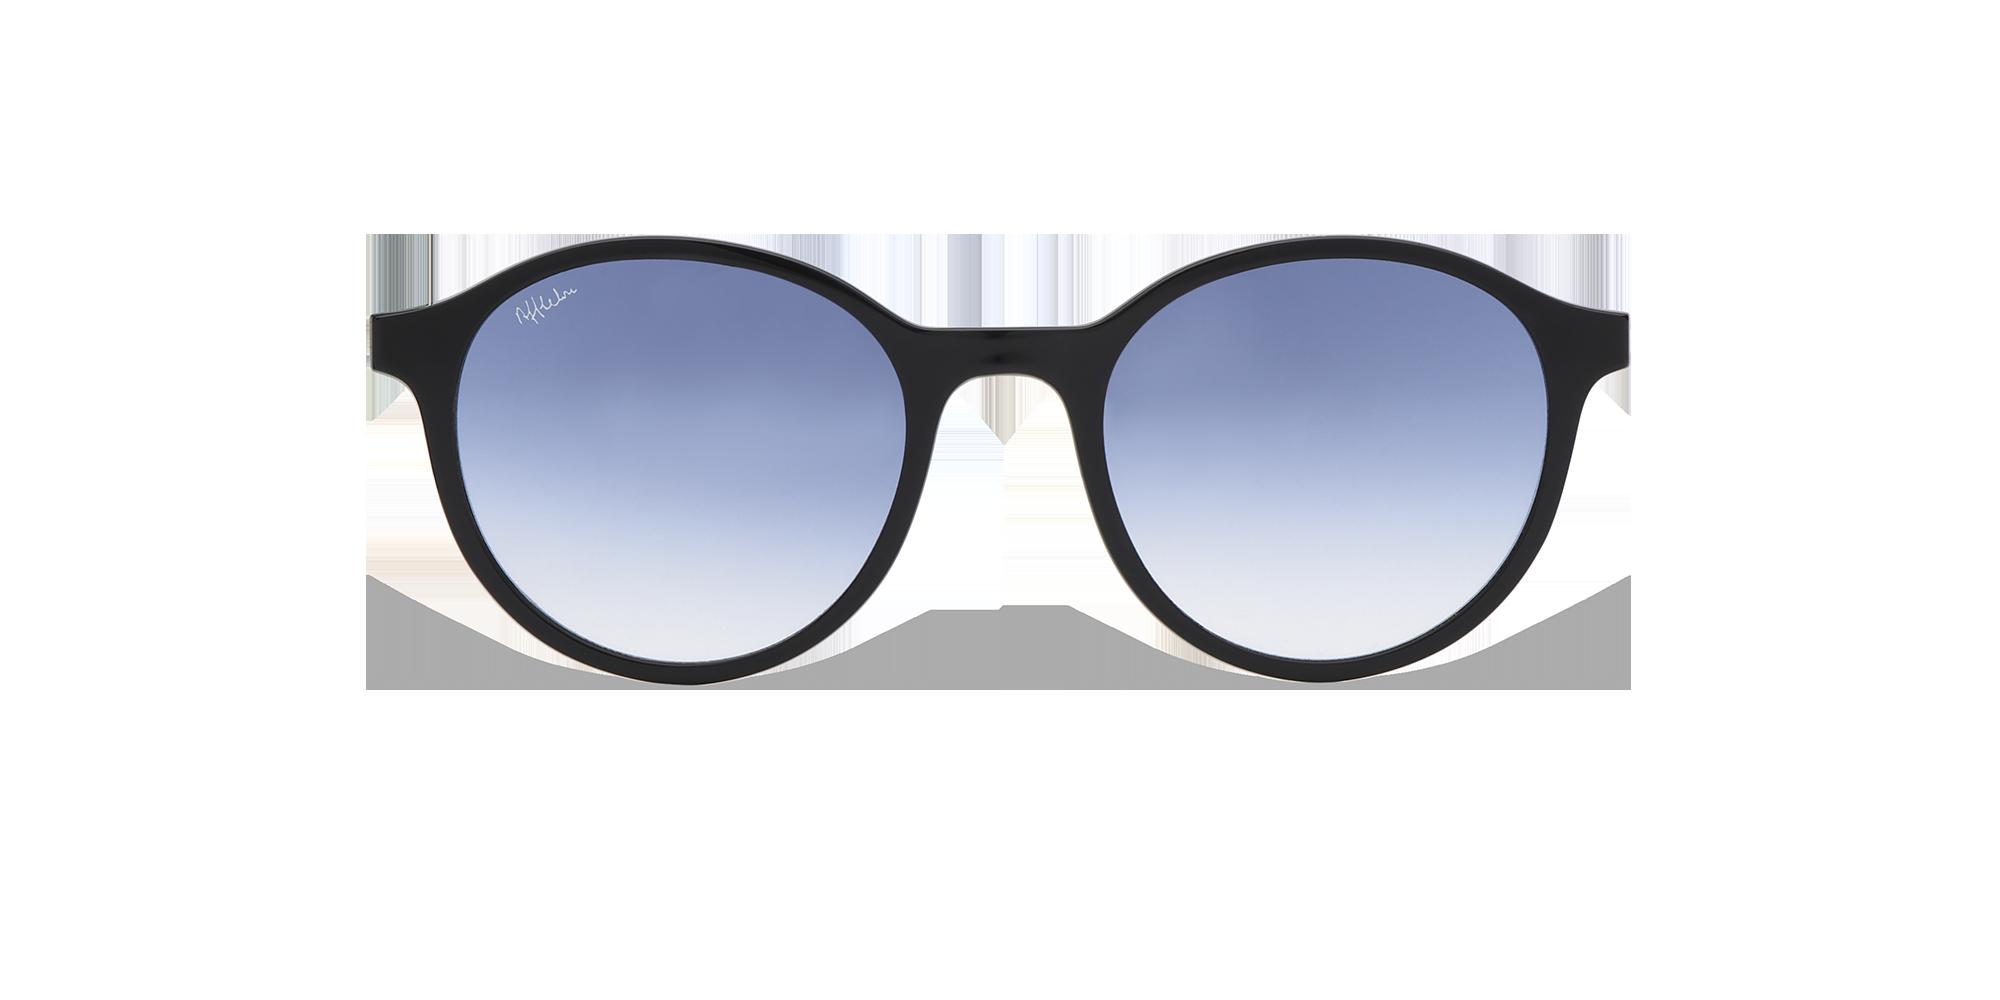 afflelou/france/products/smart_clip/clips_glasses/TMK37SUBK014919.png